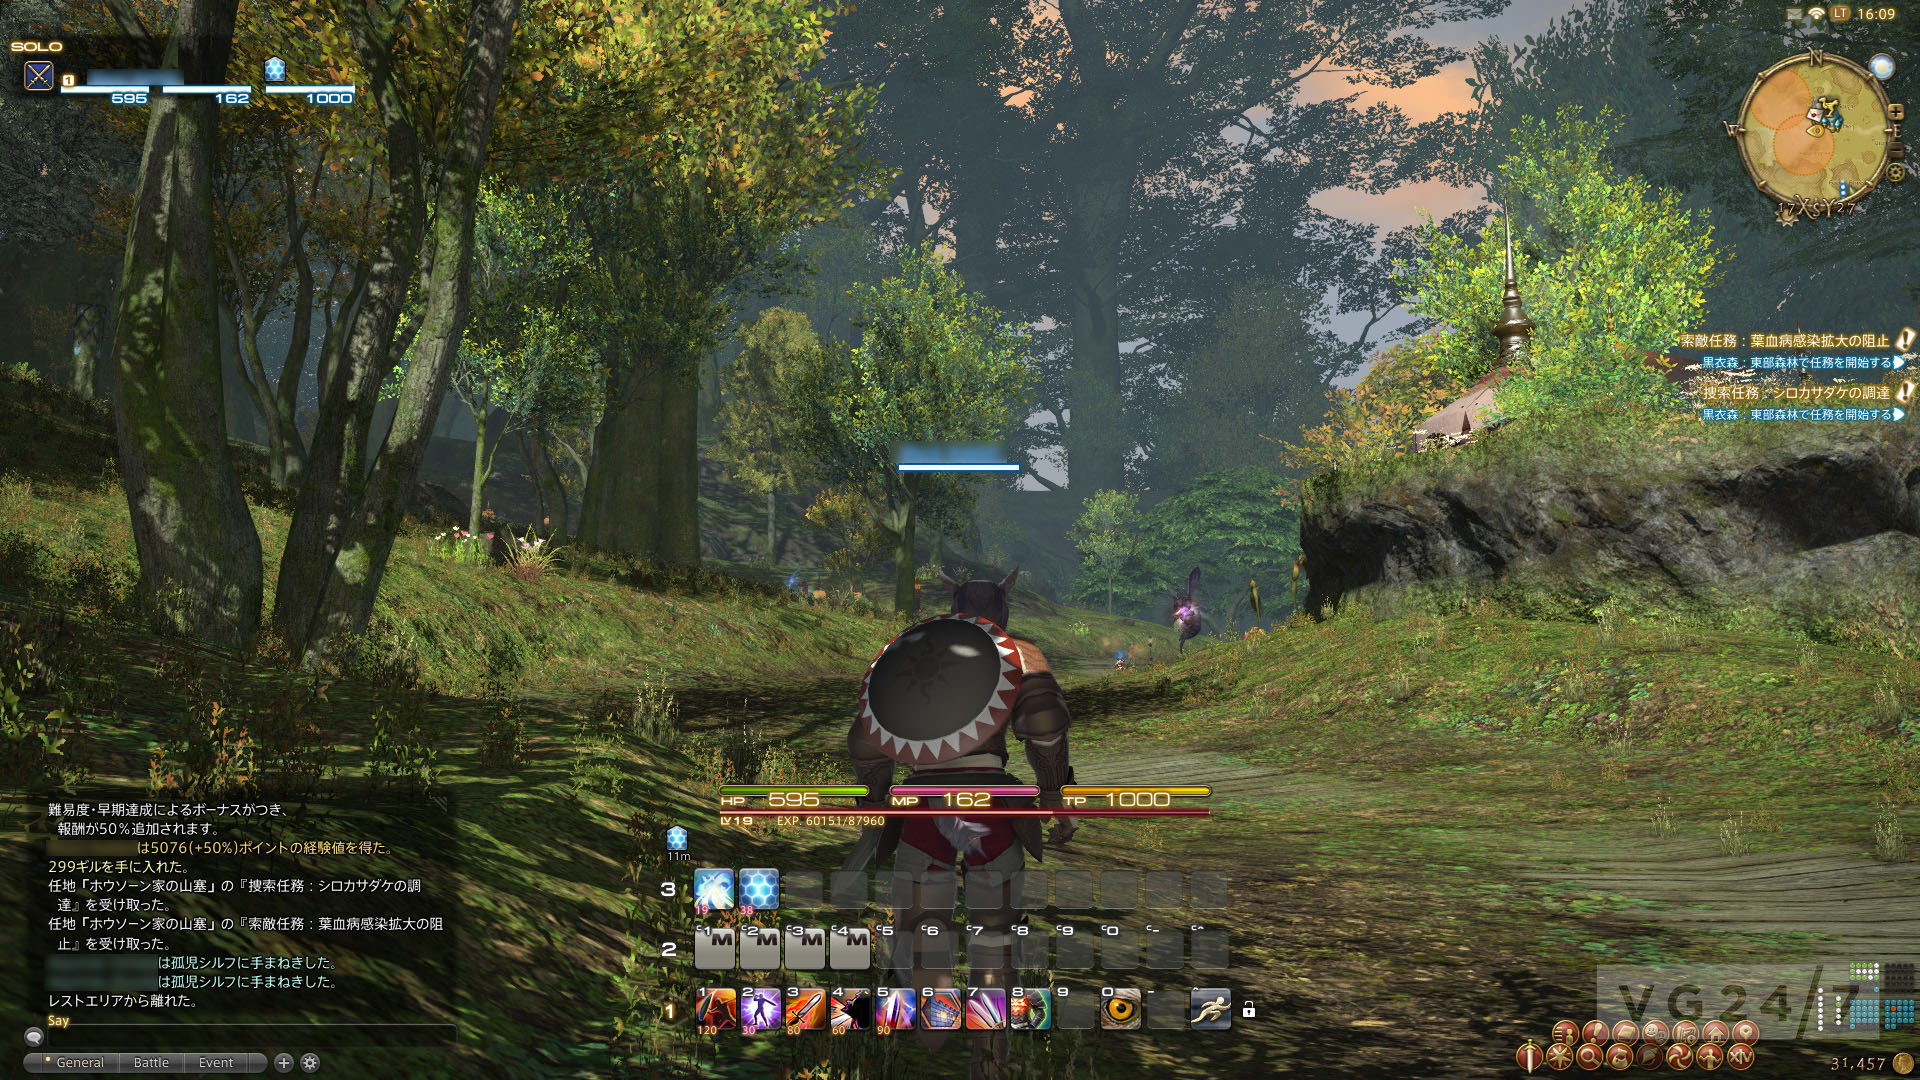 Final Fantasy 14 Beta Weekend Spawns A Barrage Of New